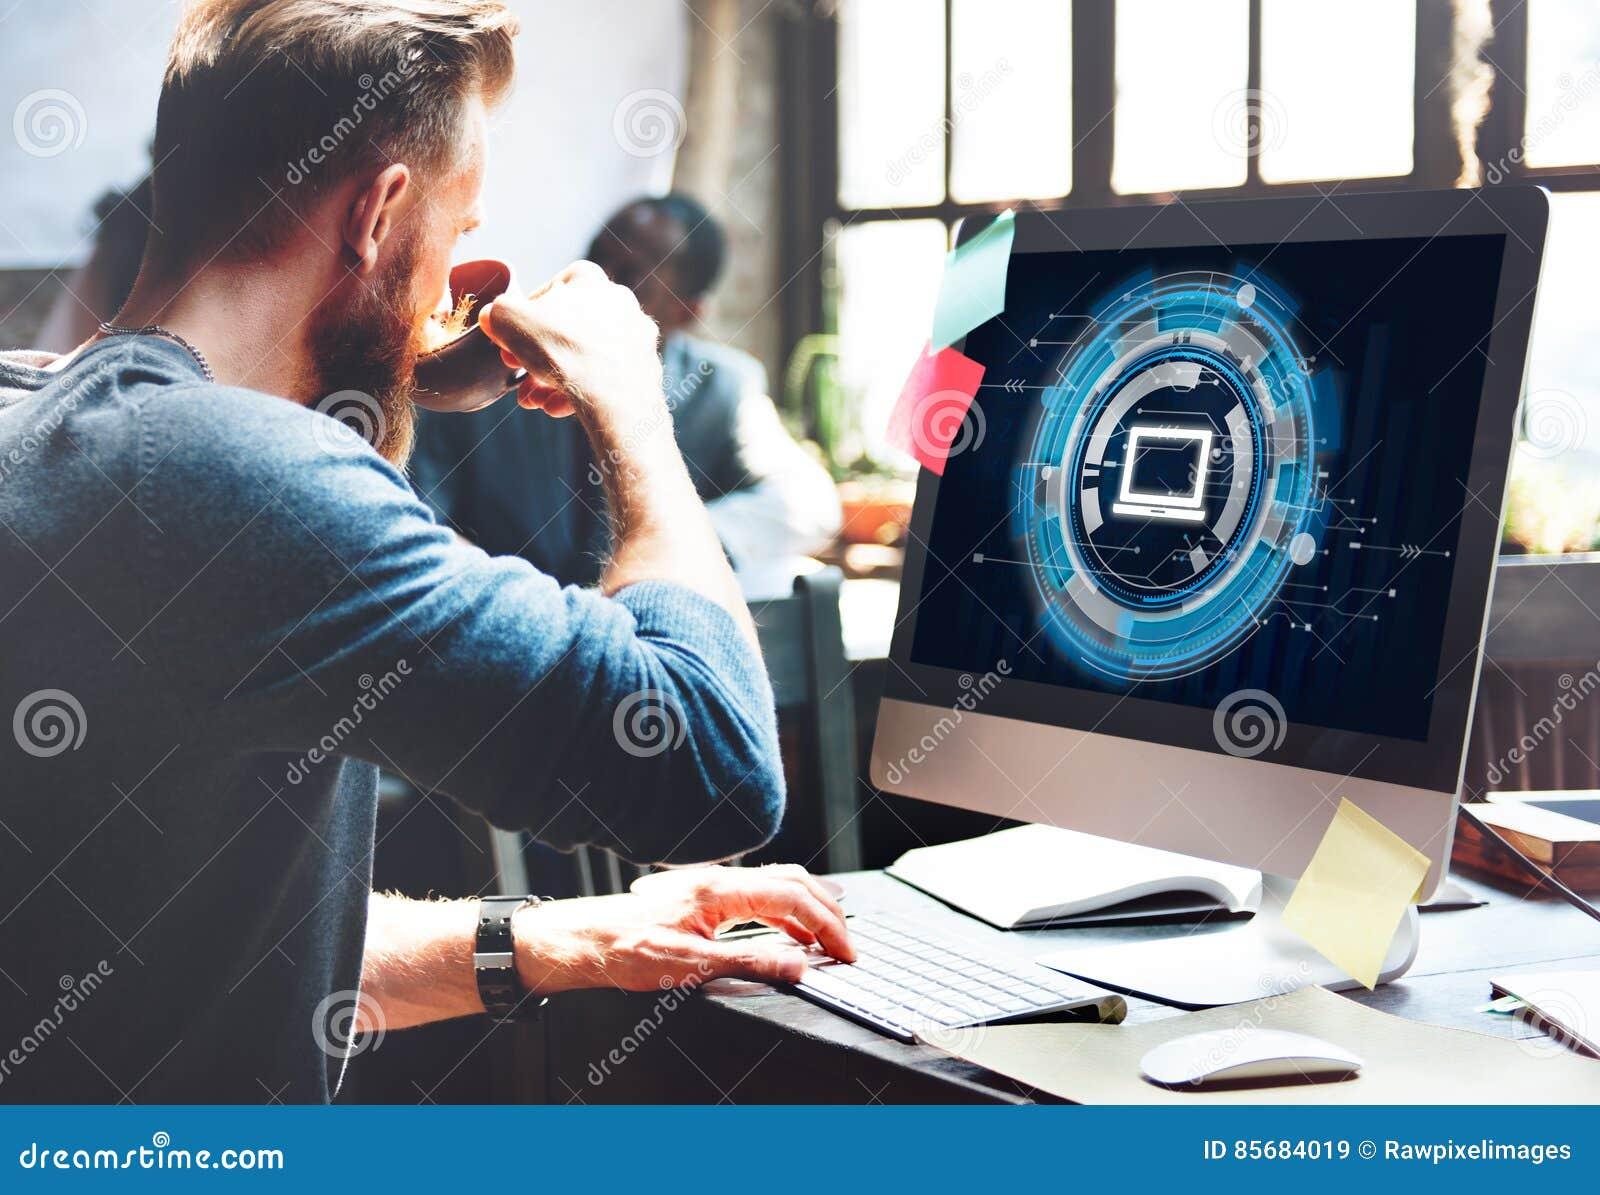 Computer-Informationstechnologie-Verbindungs-Konzept